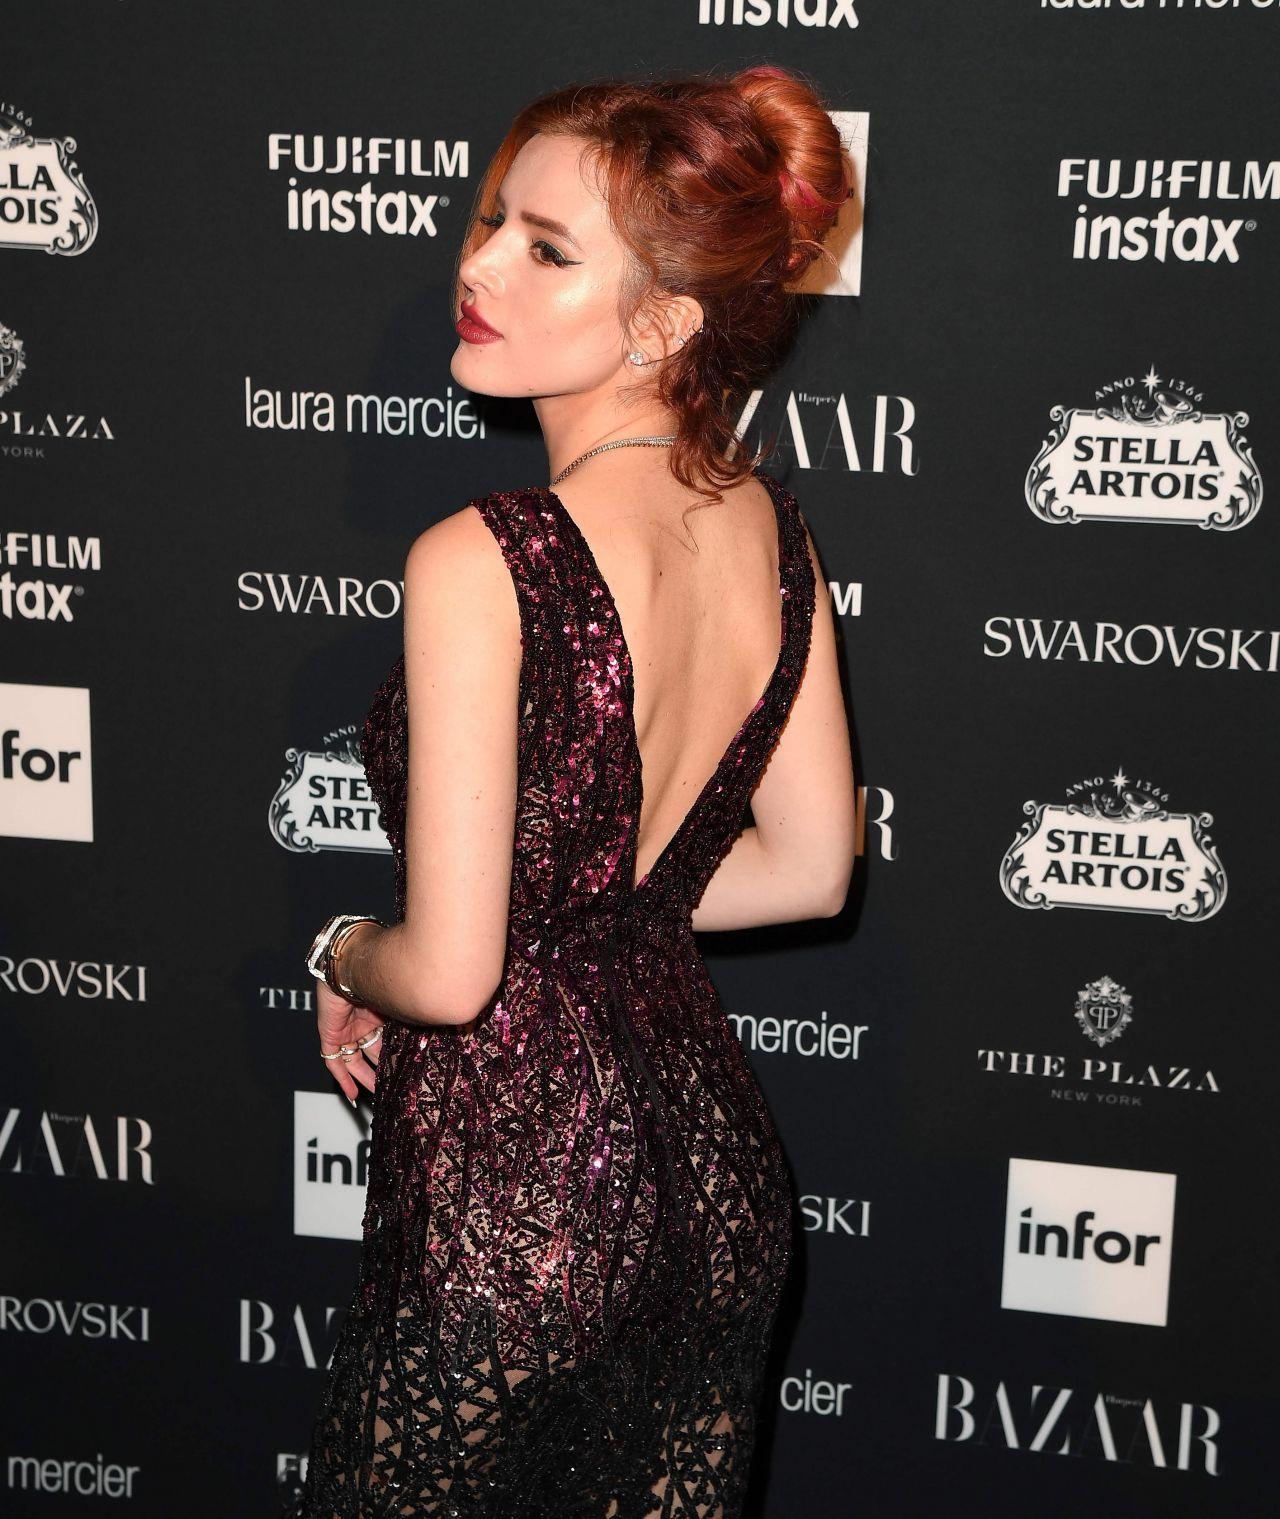 Bella Thorne Red Carpet 2017